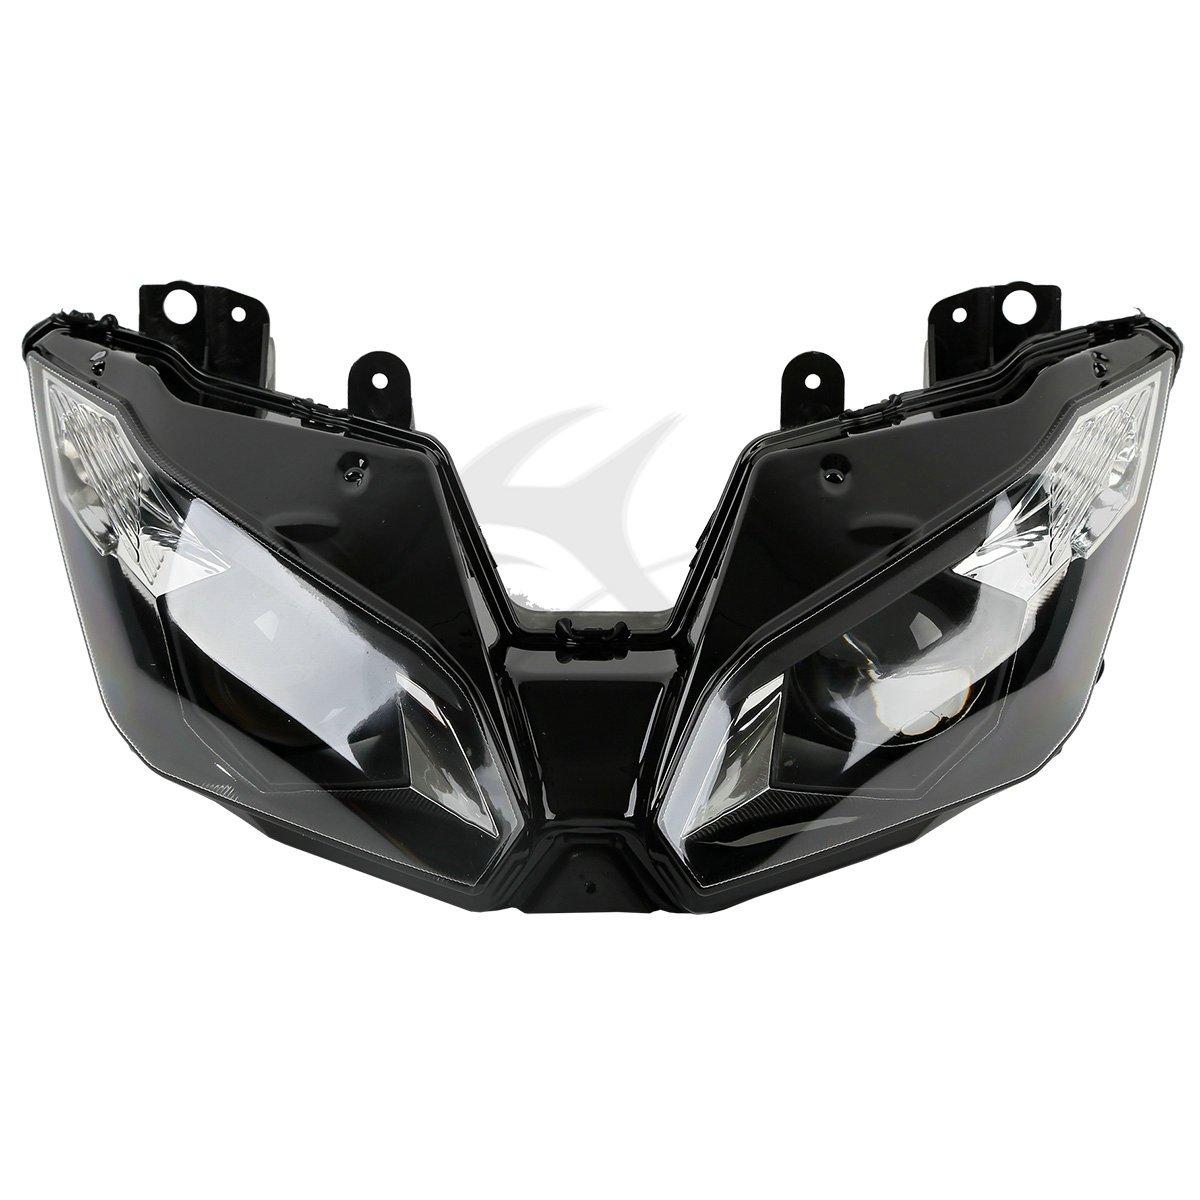 Amazon.com: XFMT Headlight Lamp Housing Assembly For ...